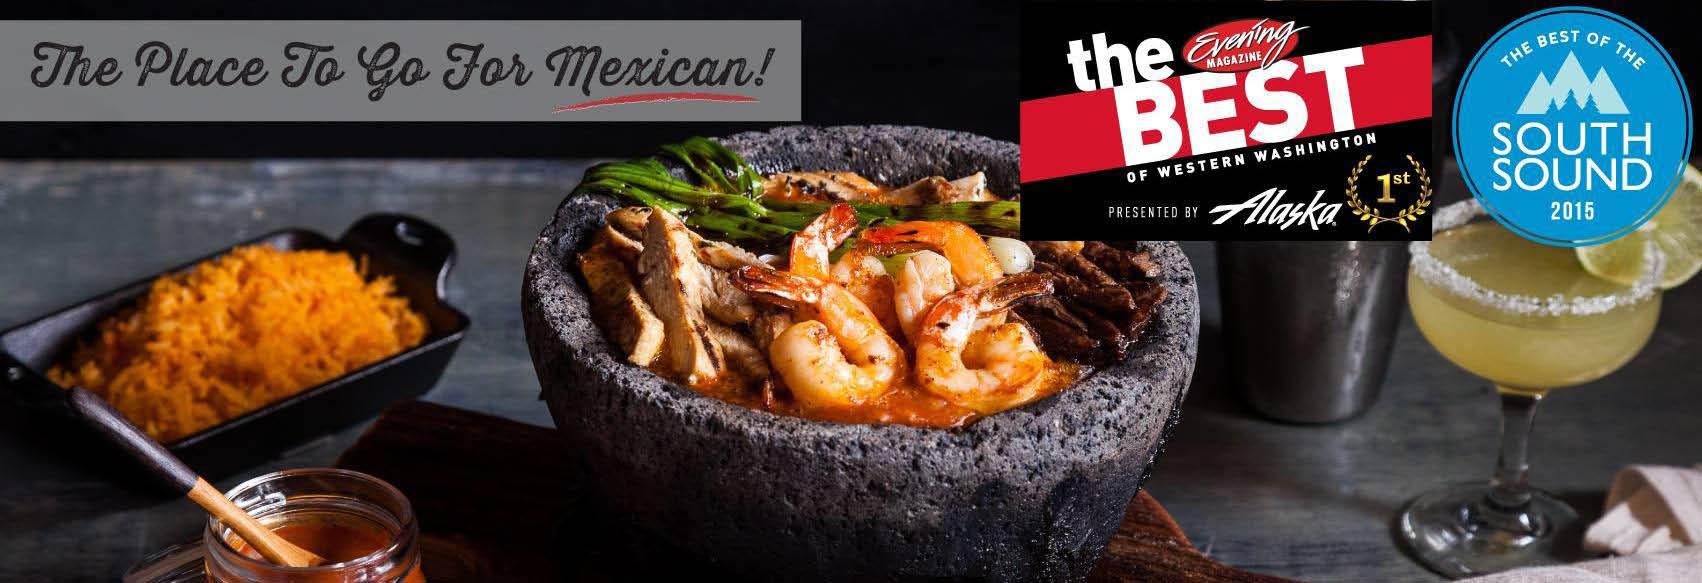 Moctezuma's Mexican Restaurant main banner image - Tacoma, WA